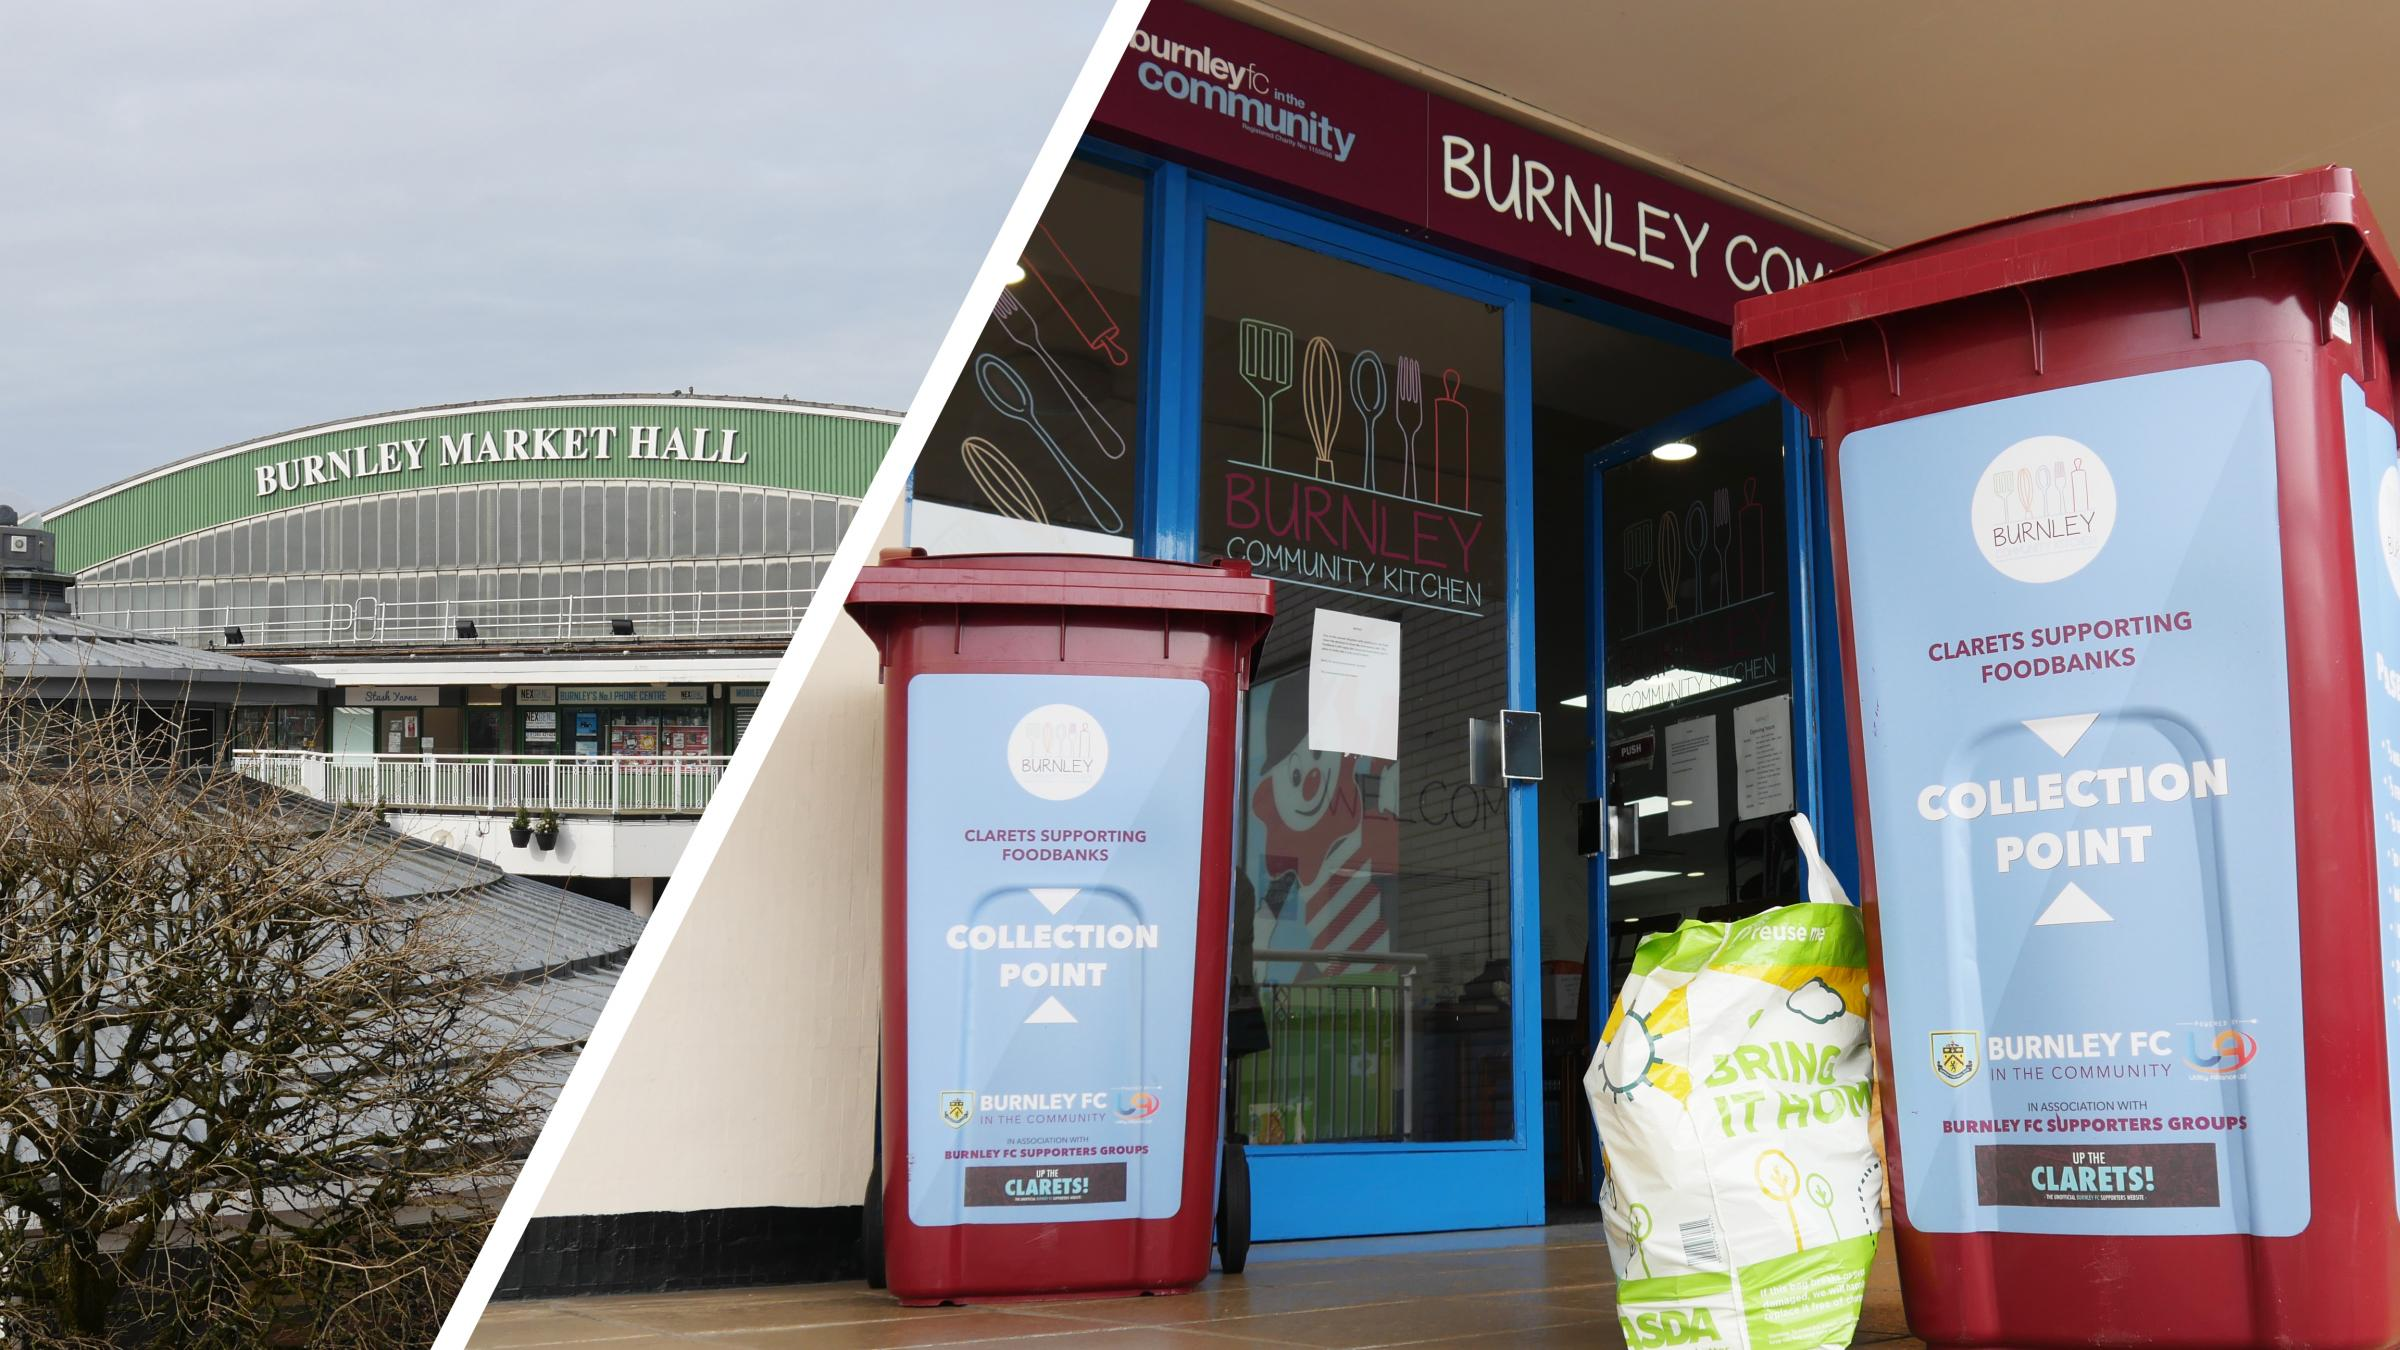 Burnley's donation to community foodbank amid coronavirus outbreak